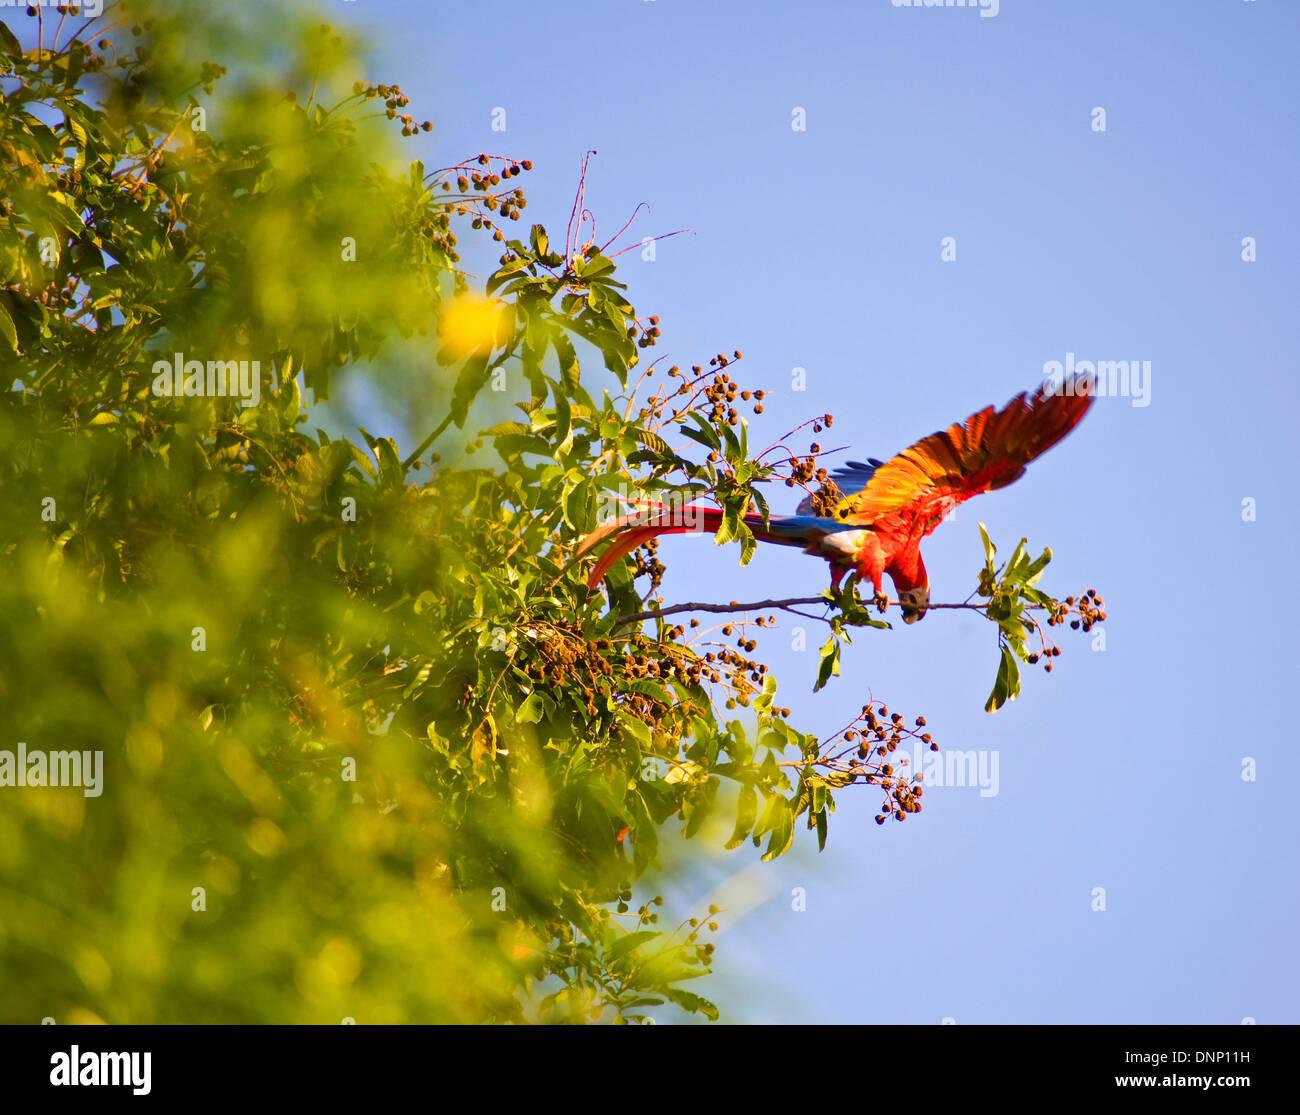 Scarlet macaw in Osa Peninsula, Costa Rica - Stock Image